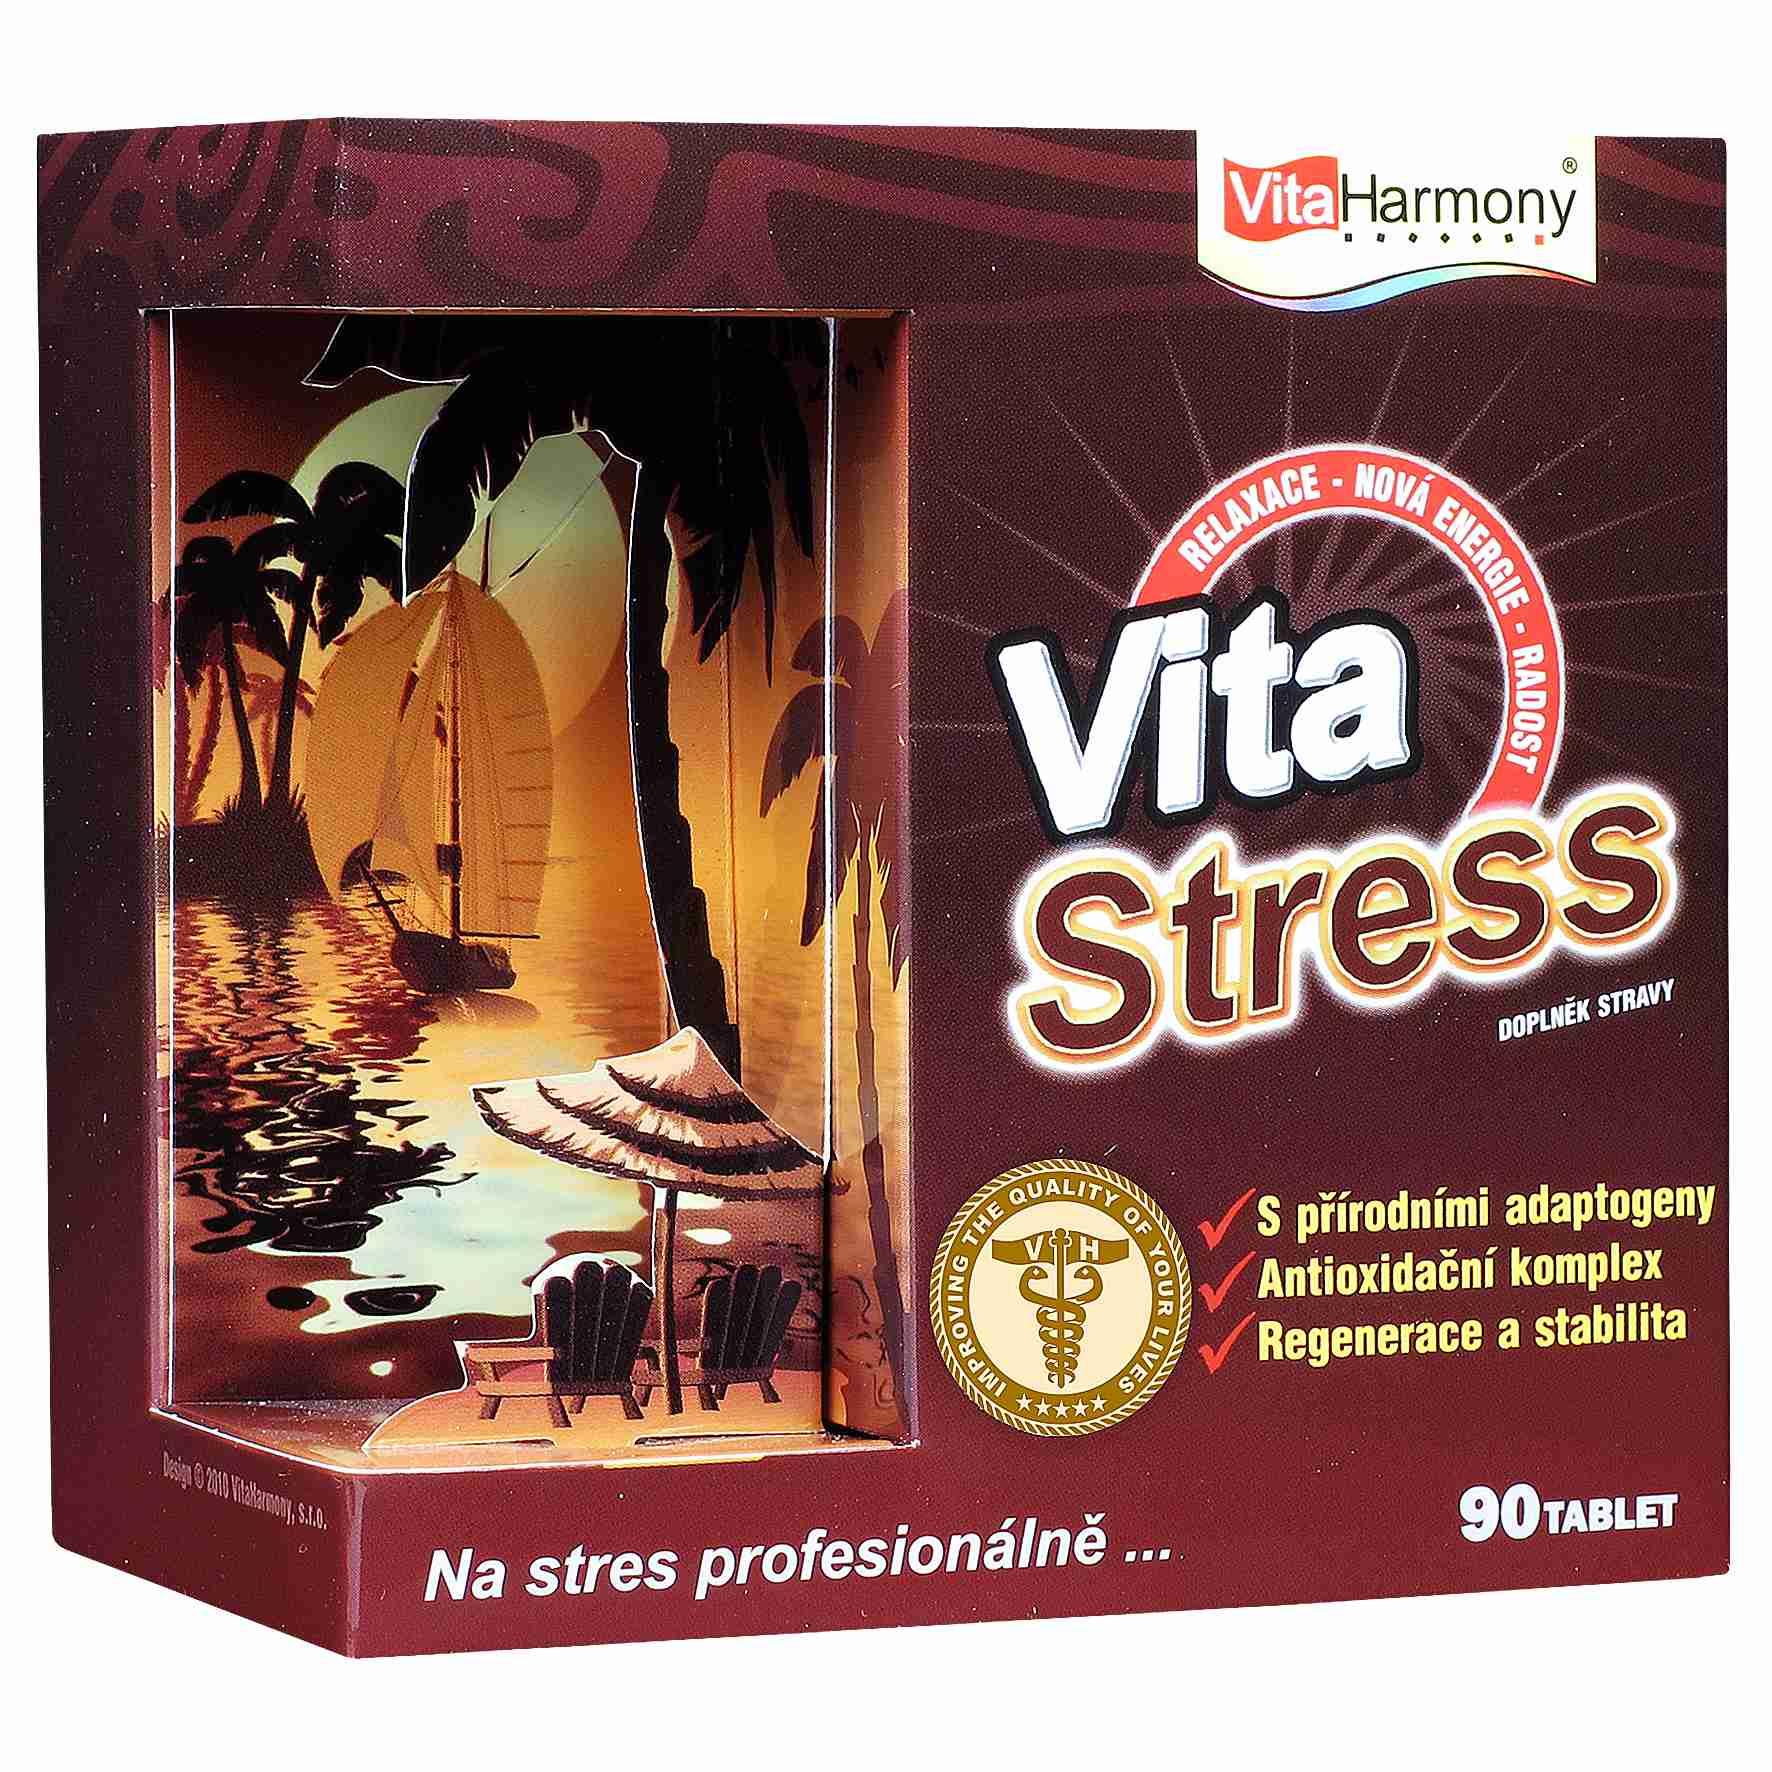 VitaHarmony VitaStress 90 tbl.